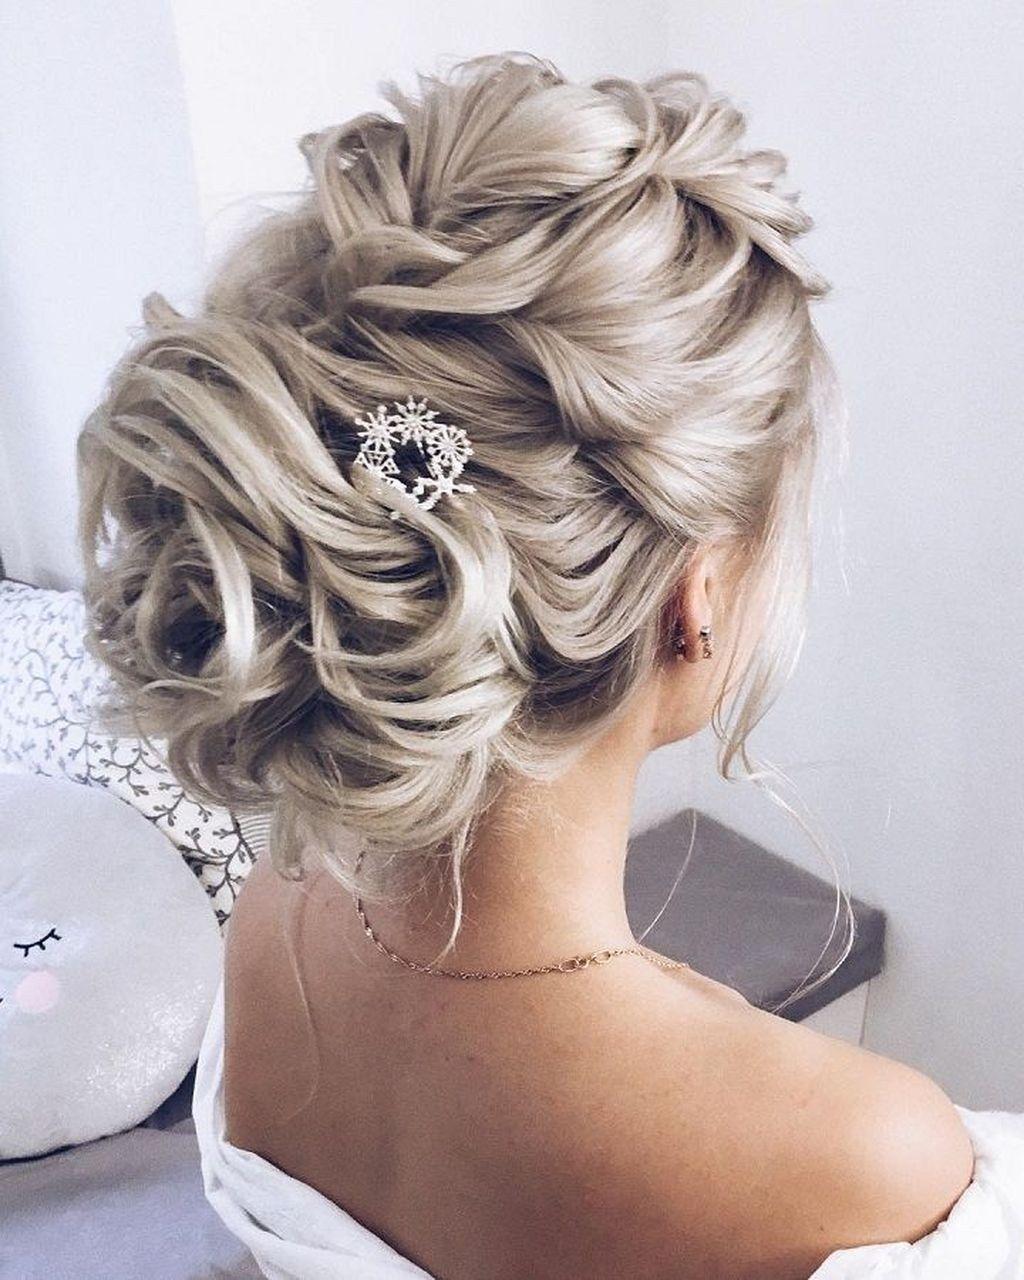 gorgeous wedding hairstyles ideas for you #weddinghairstyles